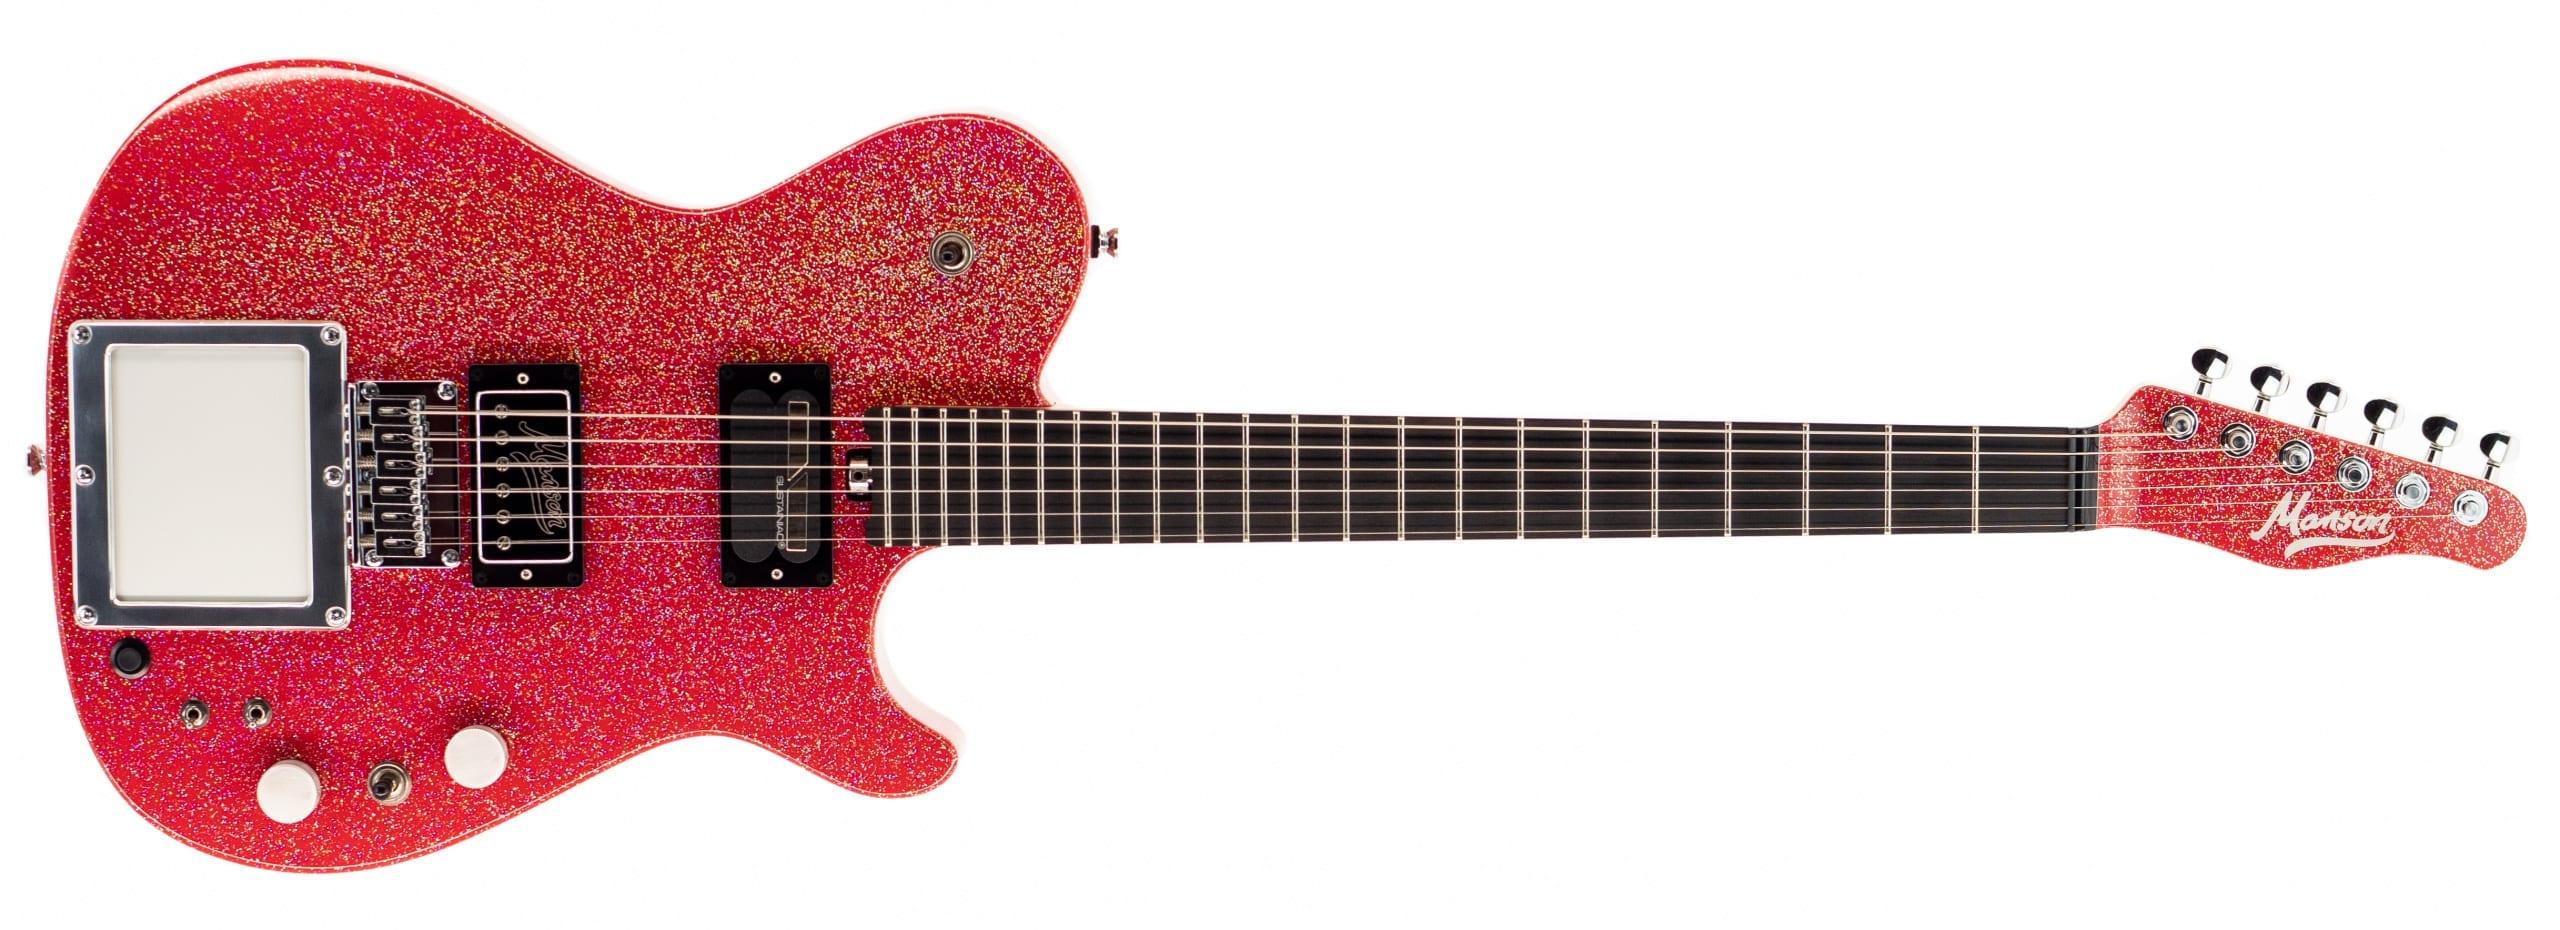 Manson MA 2020 Red Santa Limited Edition